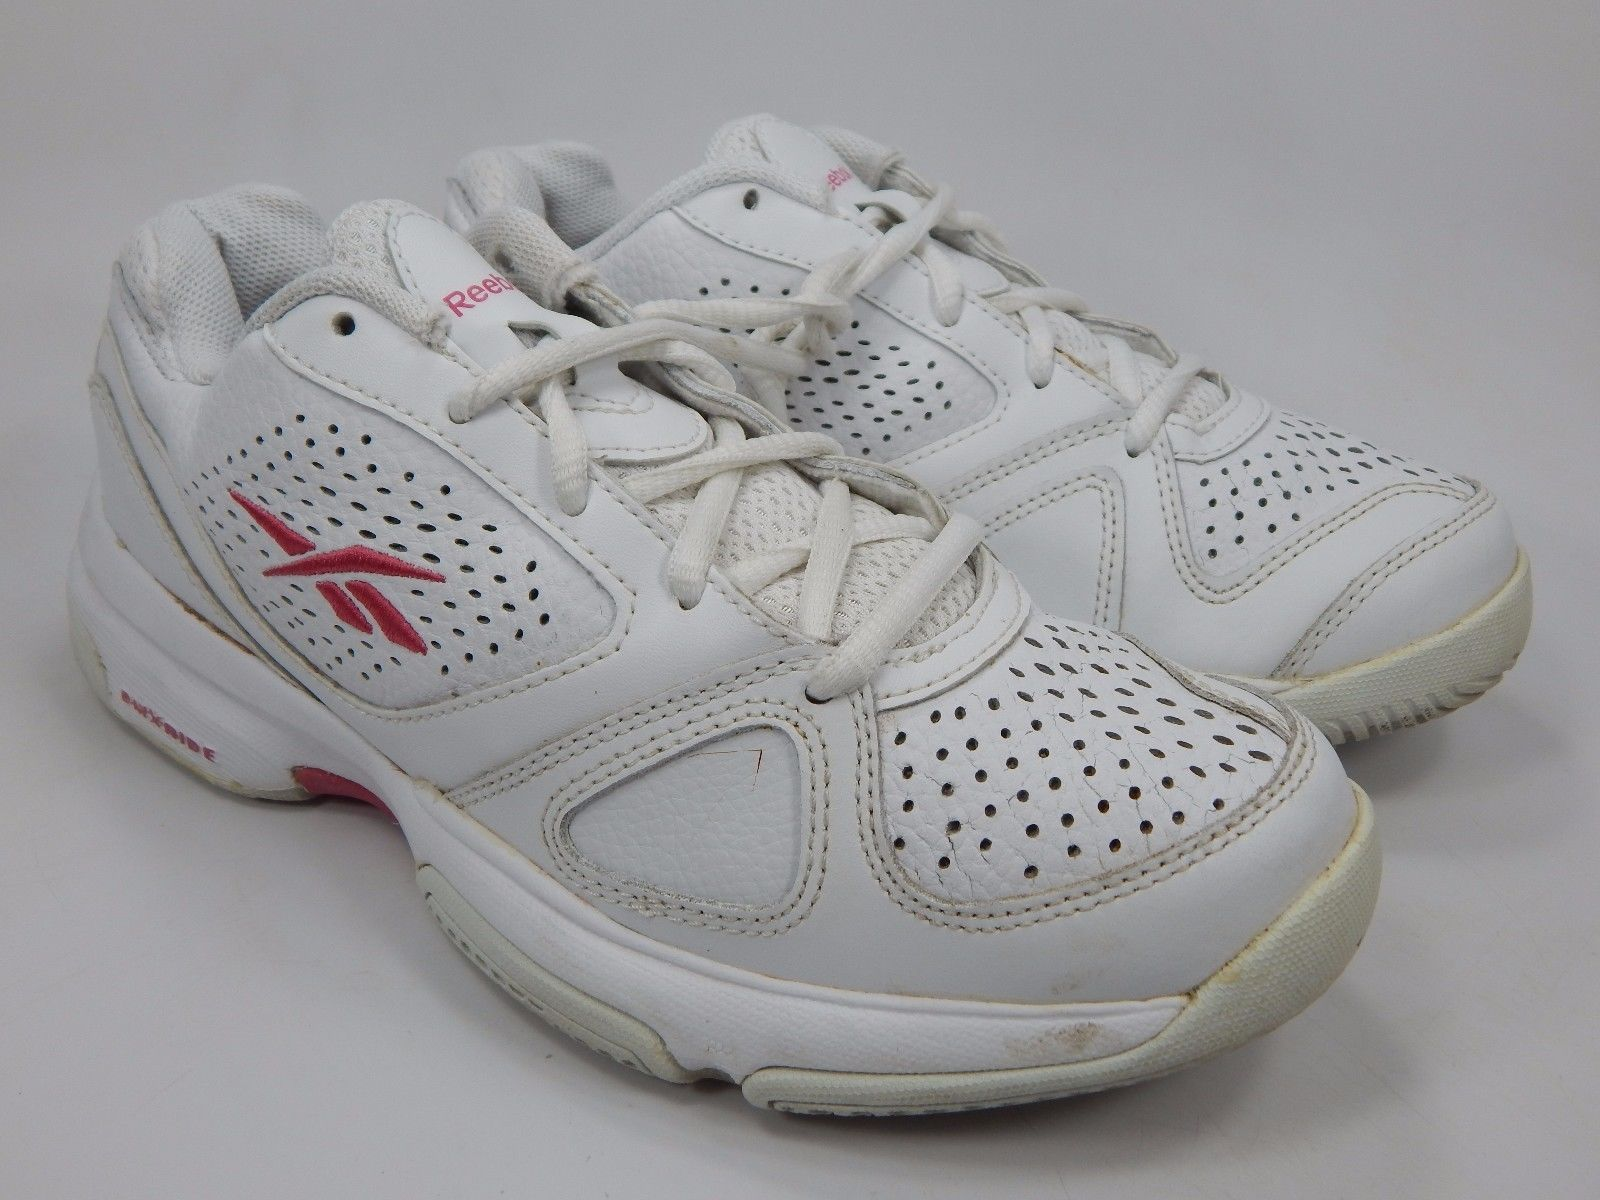 Reebok DMX Ride Women's Running Shoes Size US 7 M (B) EU 37.5 White 6-J03486